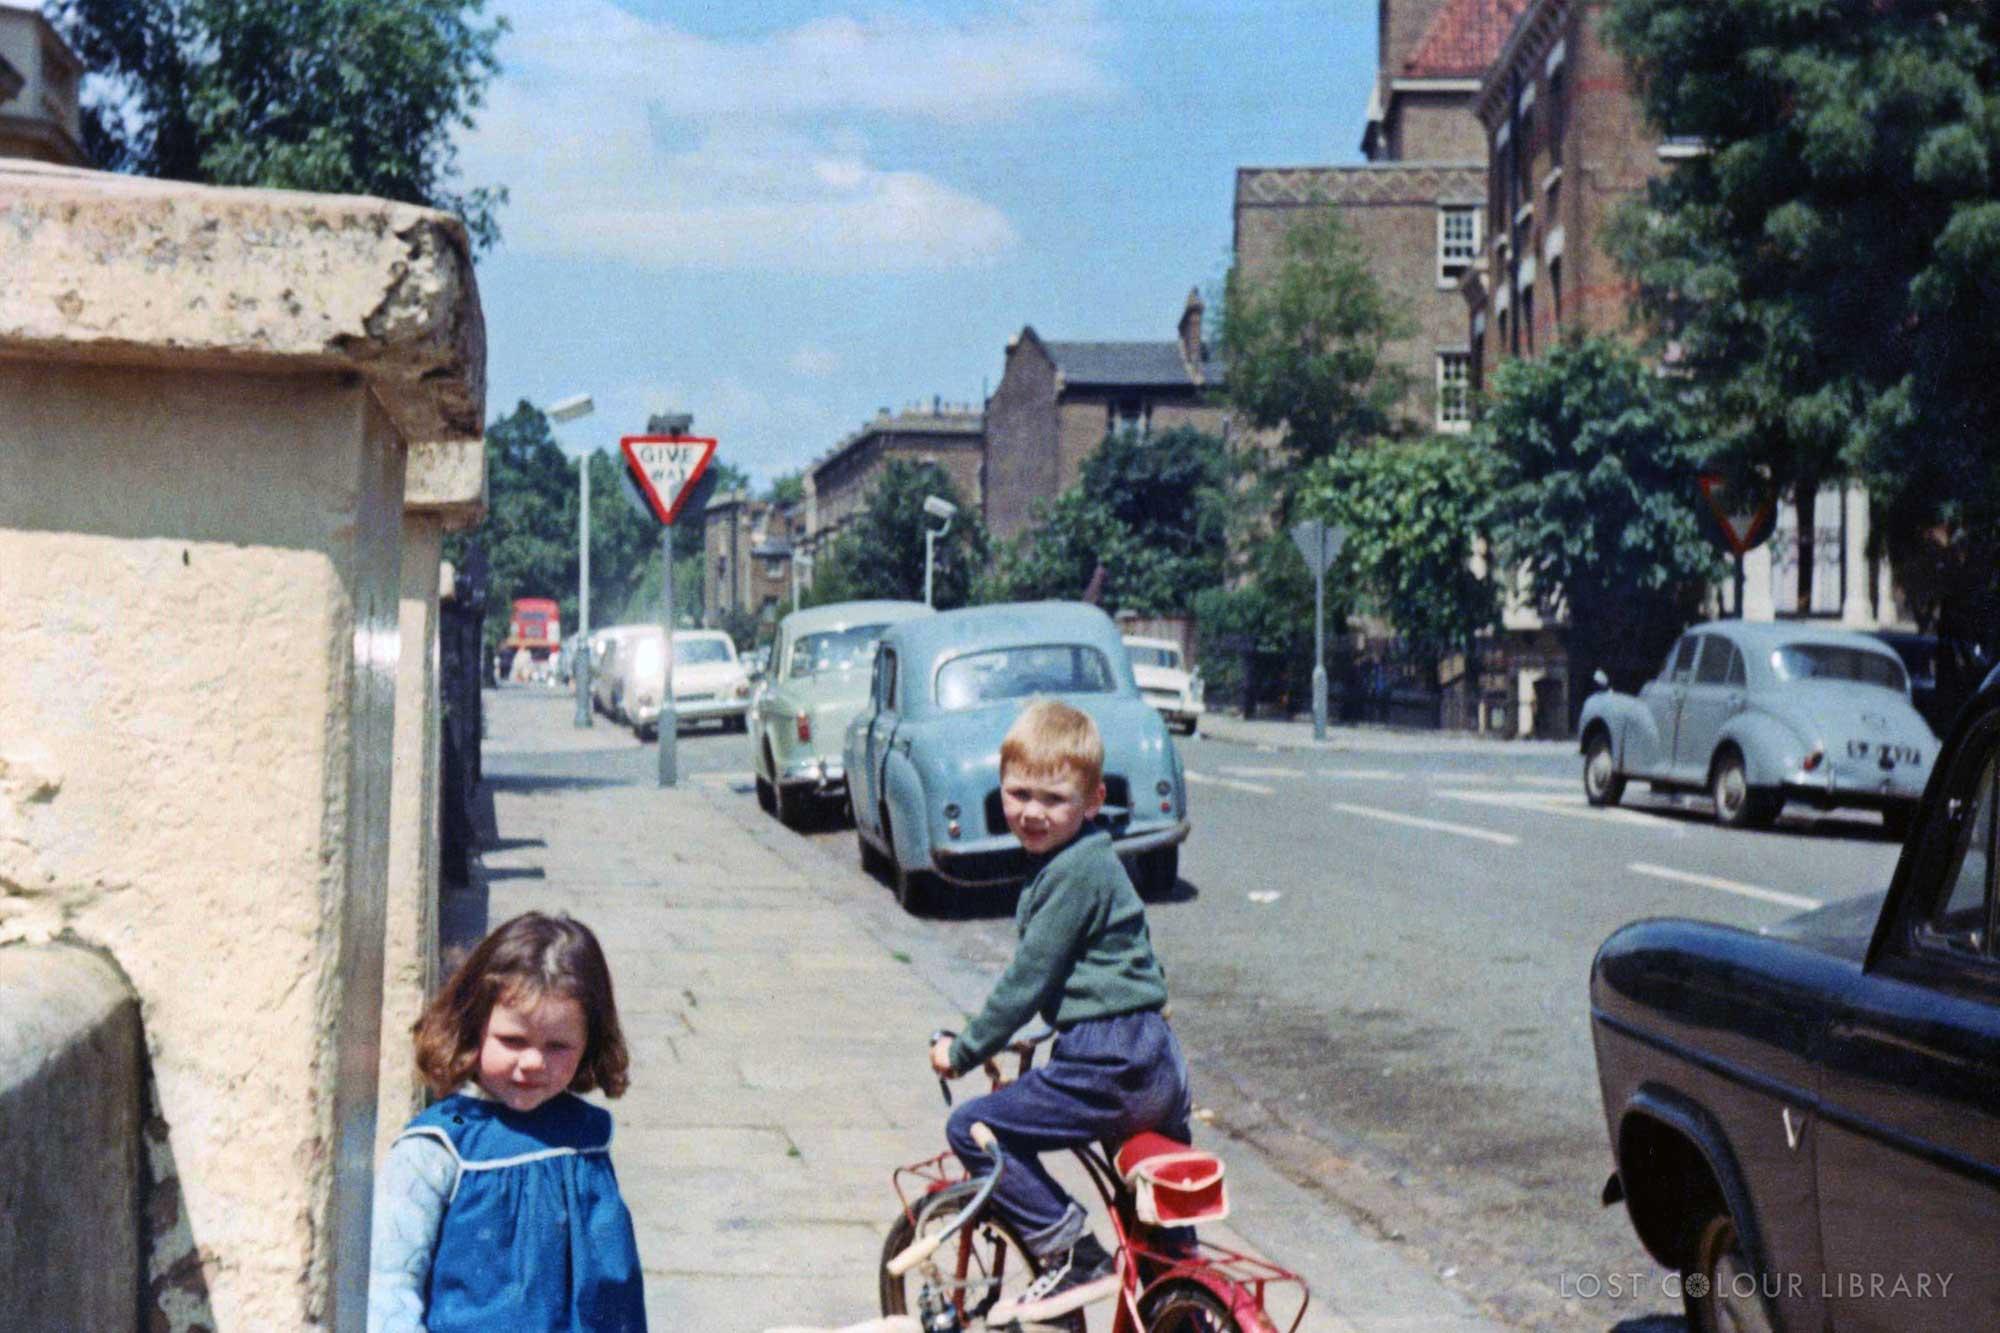 lcl-ww-rockley-road-shephers-bush-1967-site-wm.jpg